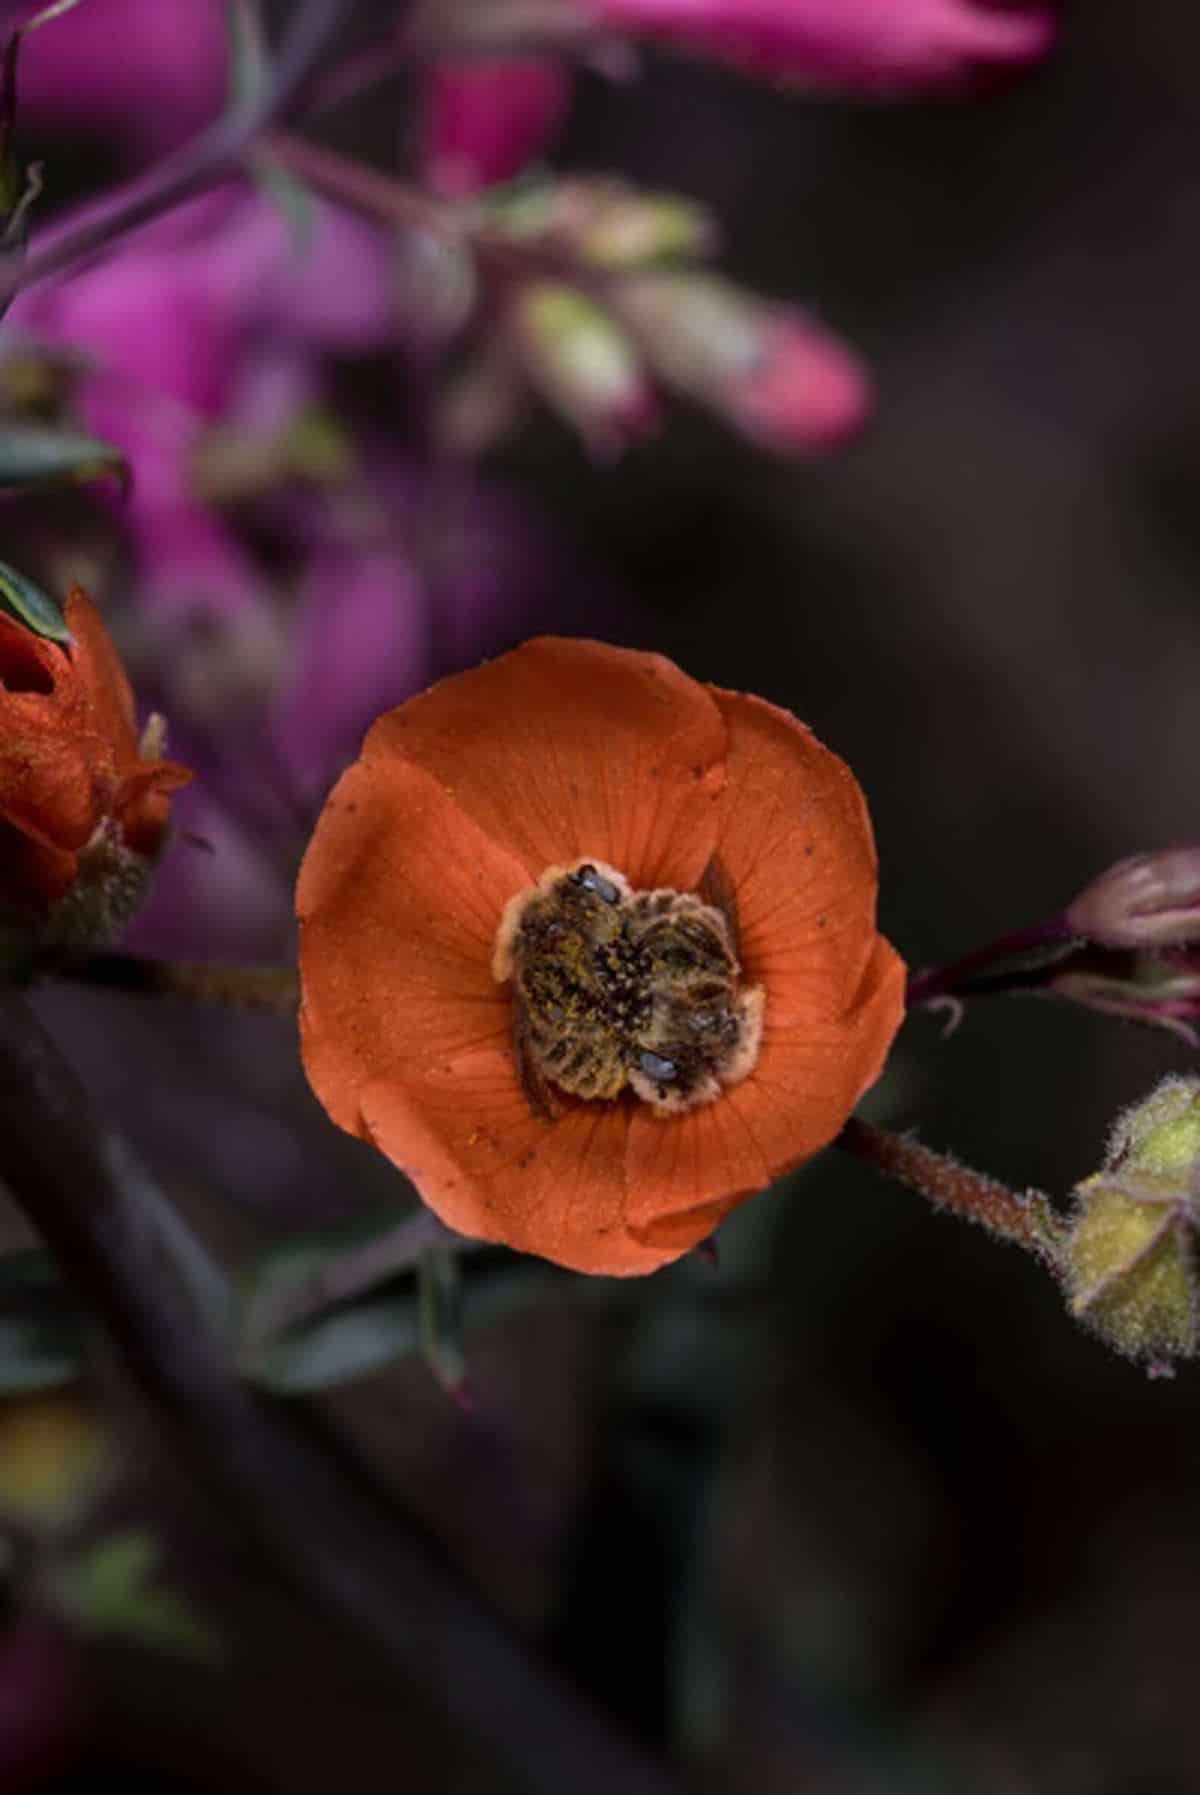 Bees Sleeping in a Globe Mallow Flower